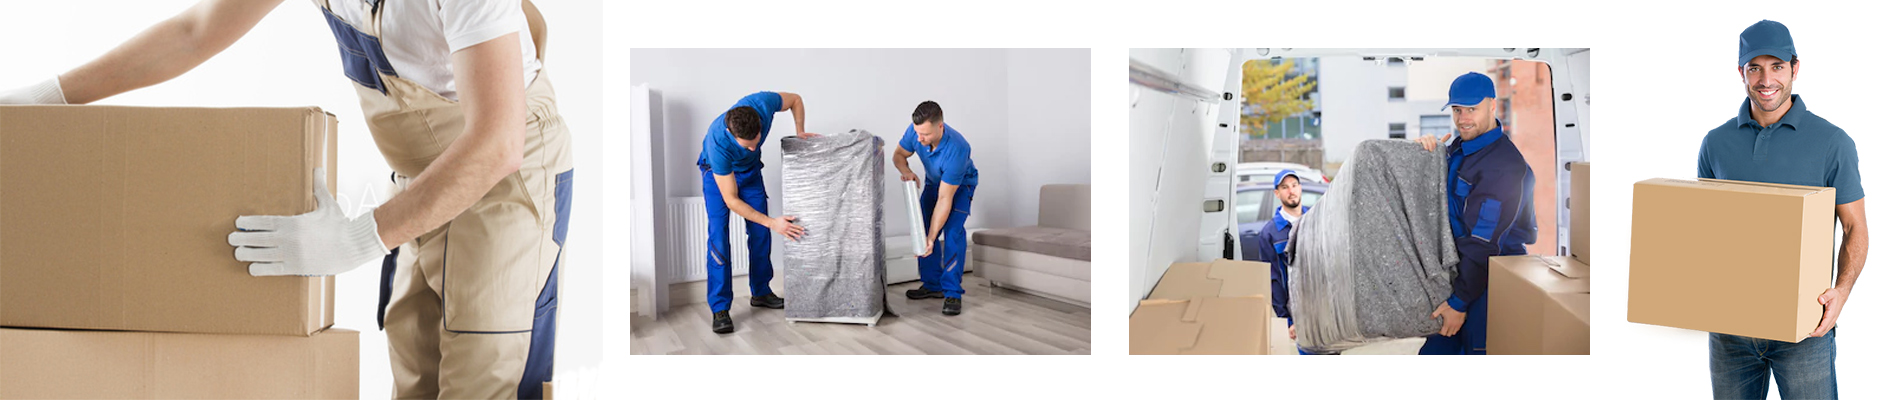 man moving boxes